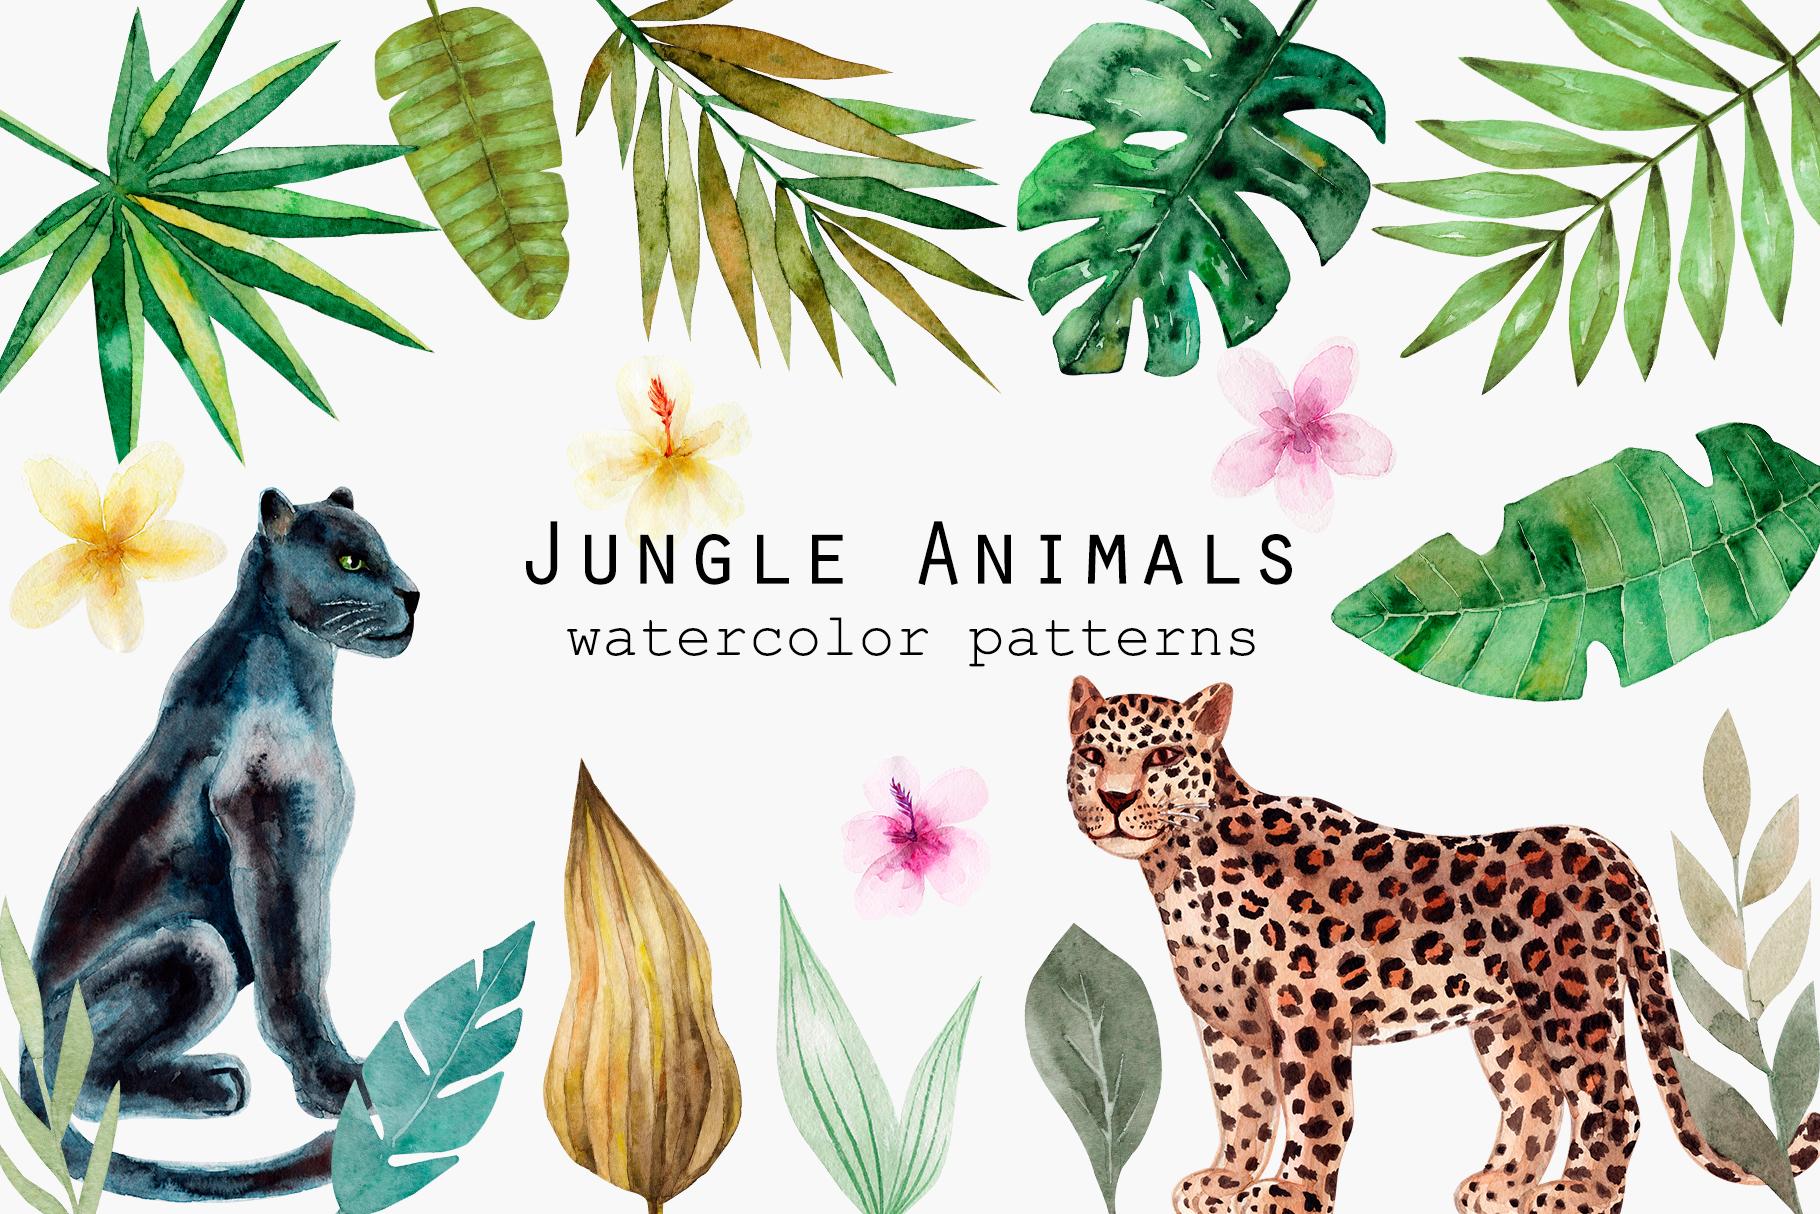 Jungle Animals Watercolor Patterns